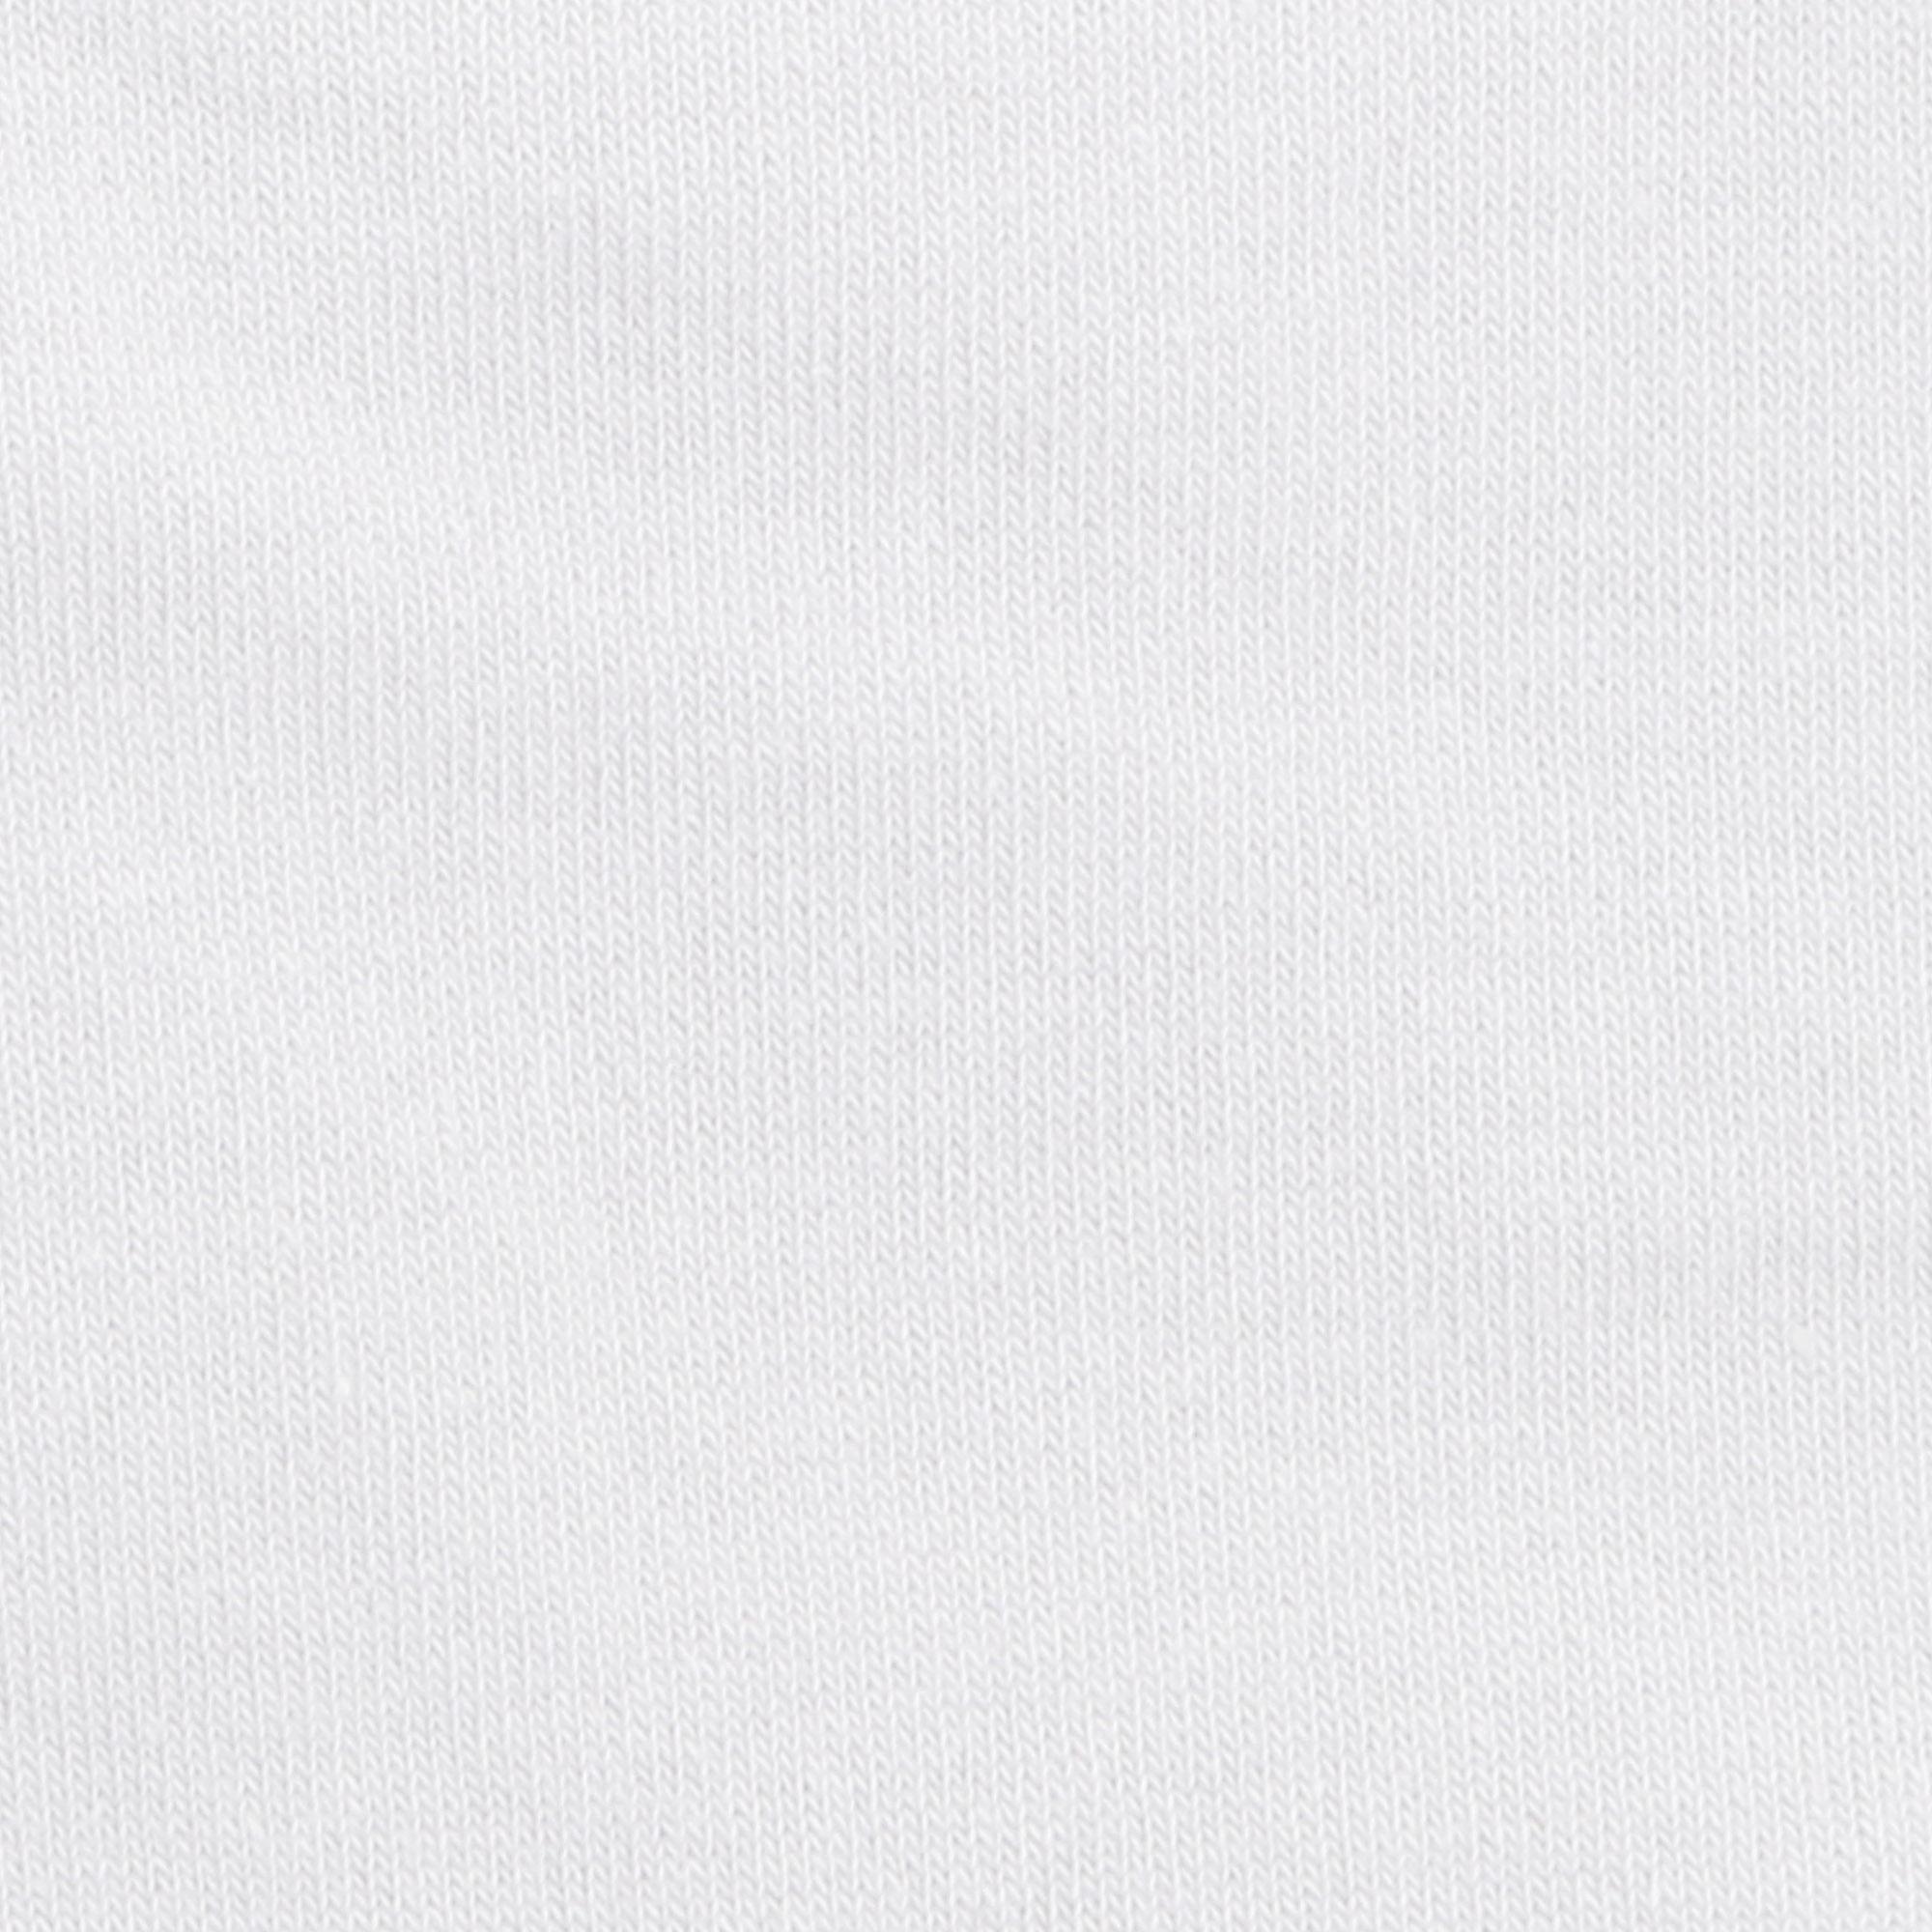 Носки мужские Lucky Socks 25-27 серые 1 пара